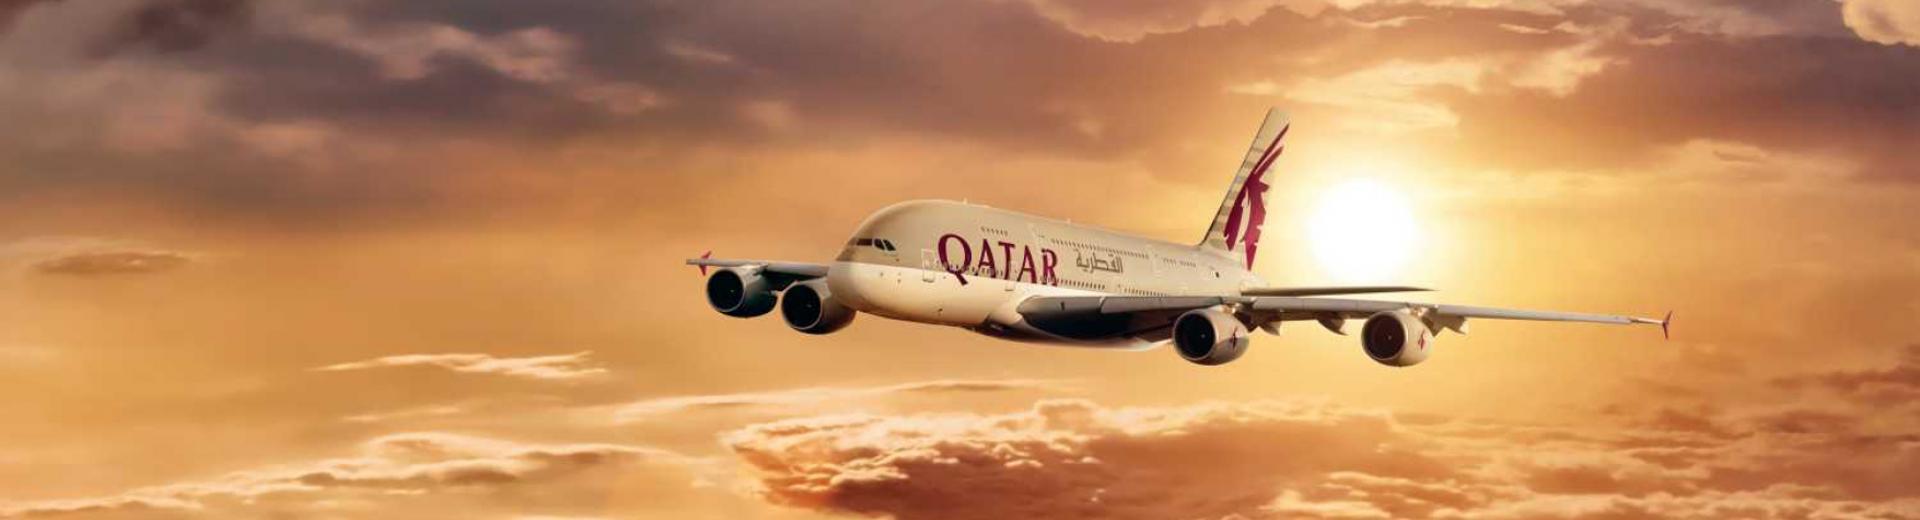 Review qatar airways business class travel associates qatar airways stopboris Image collections